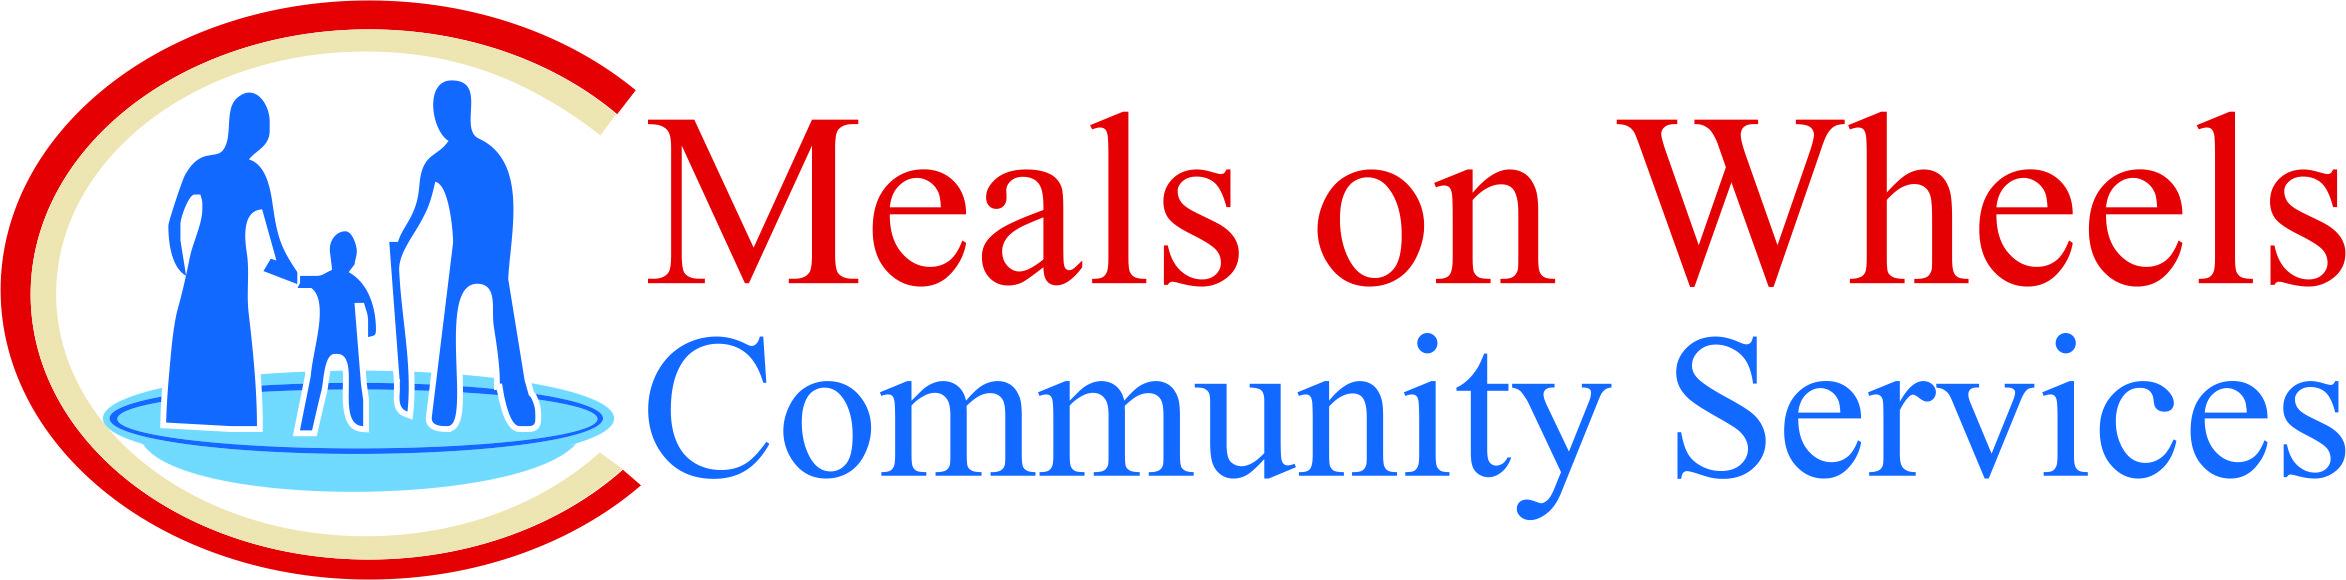 Meals On Wheels Logo - Intercape Freightliner Client